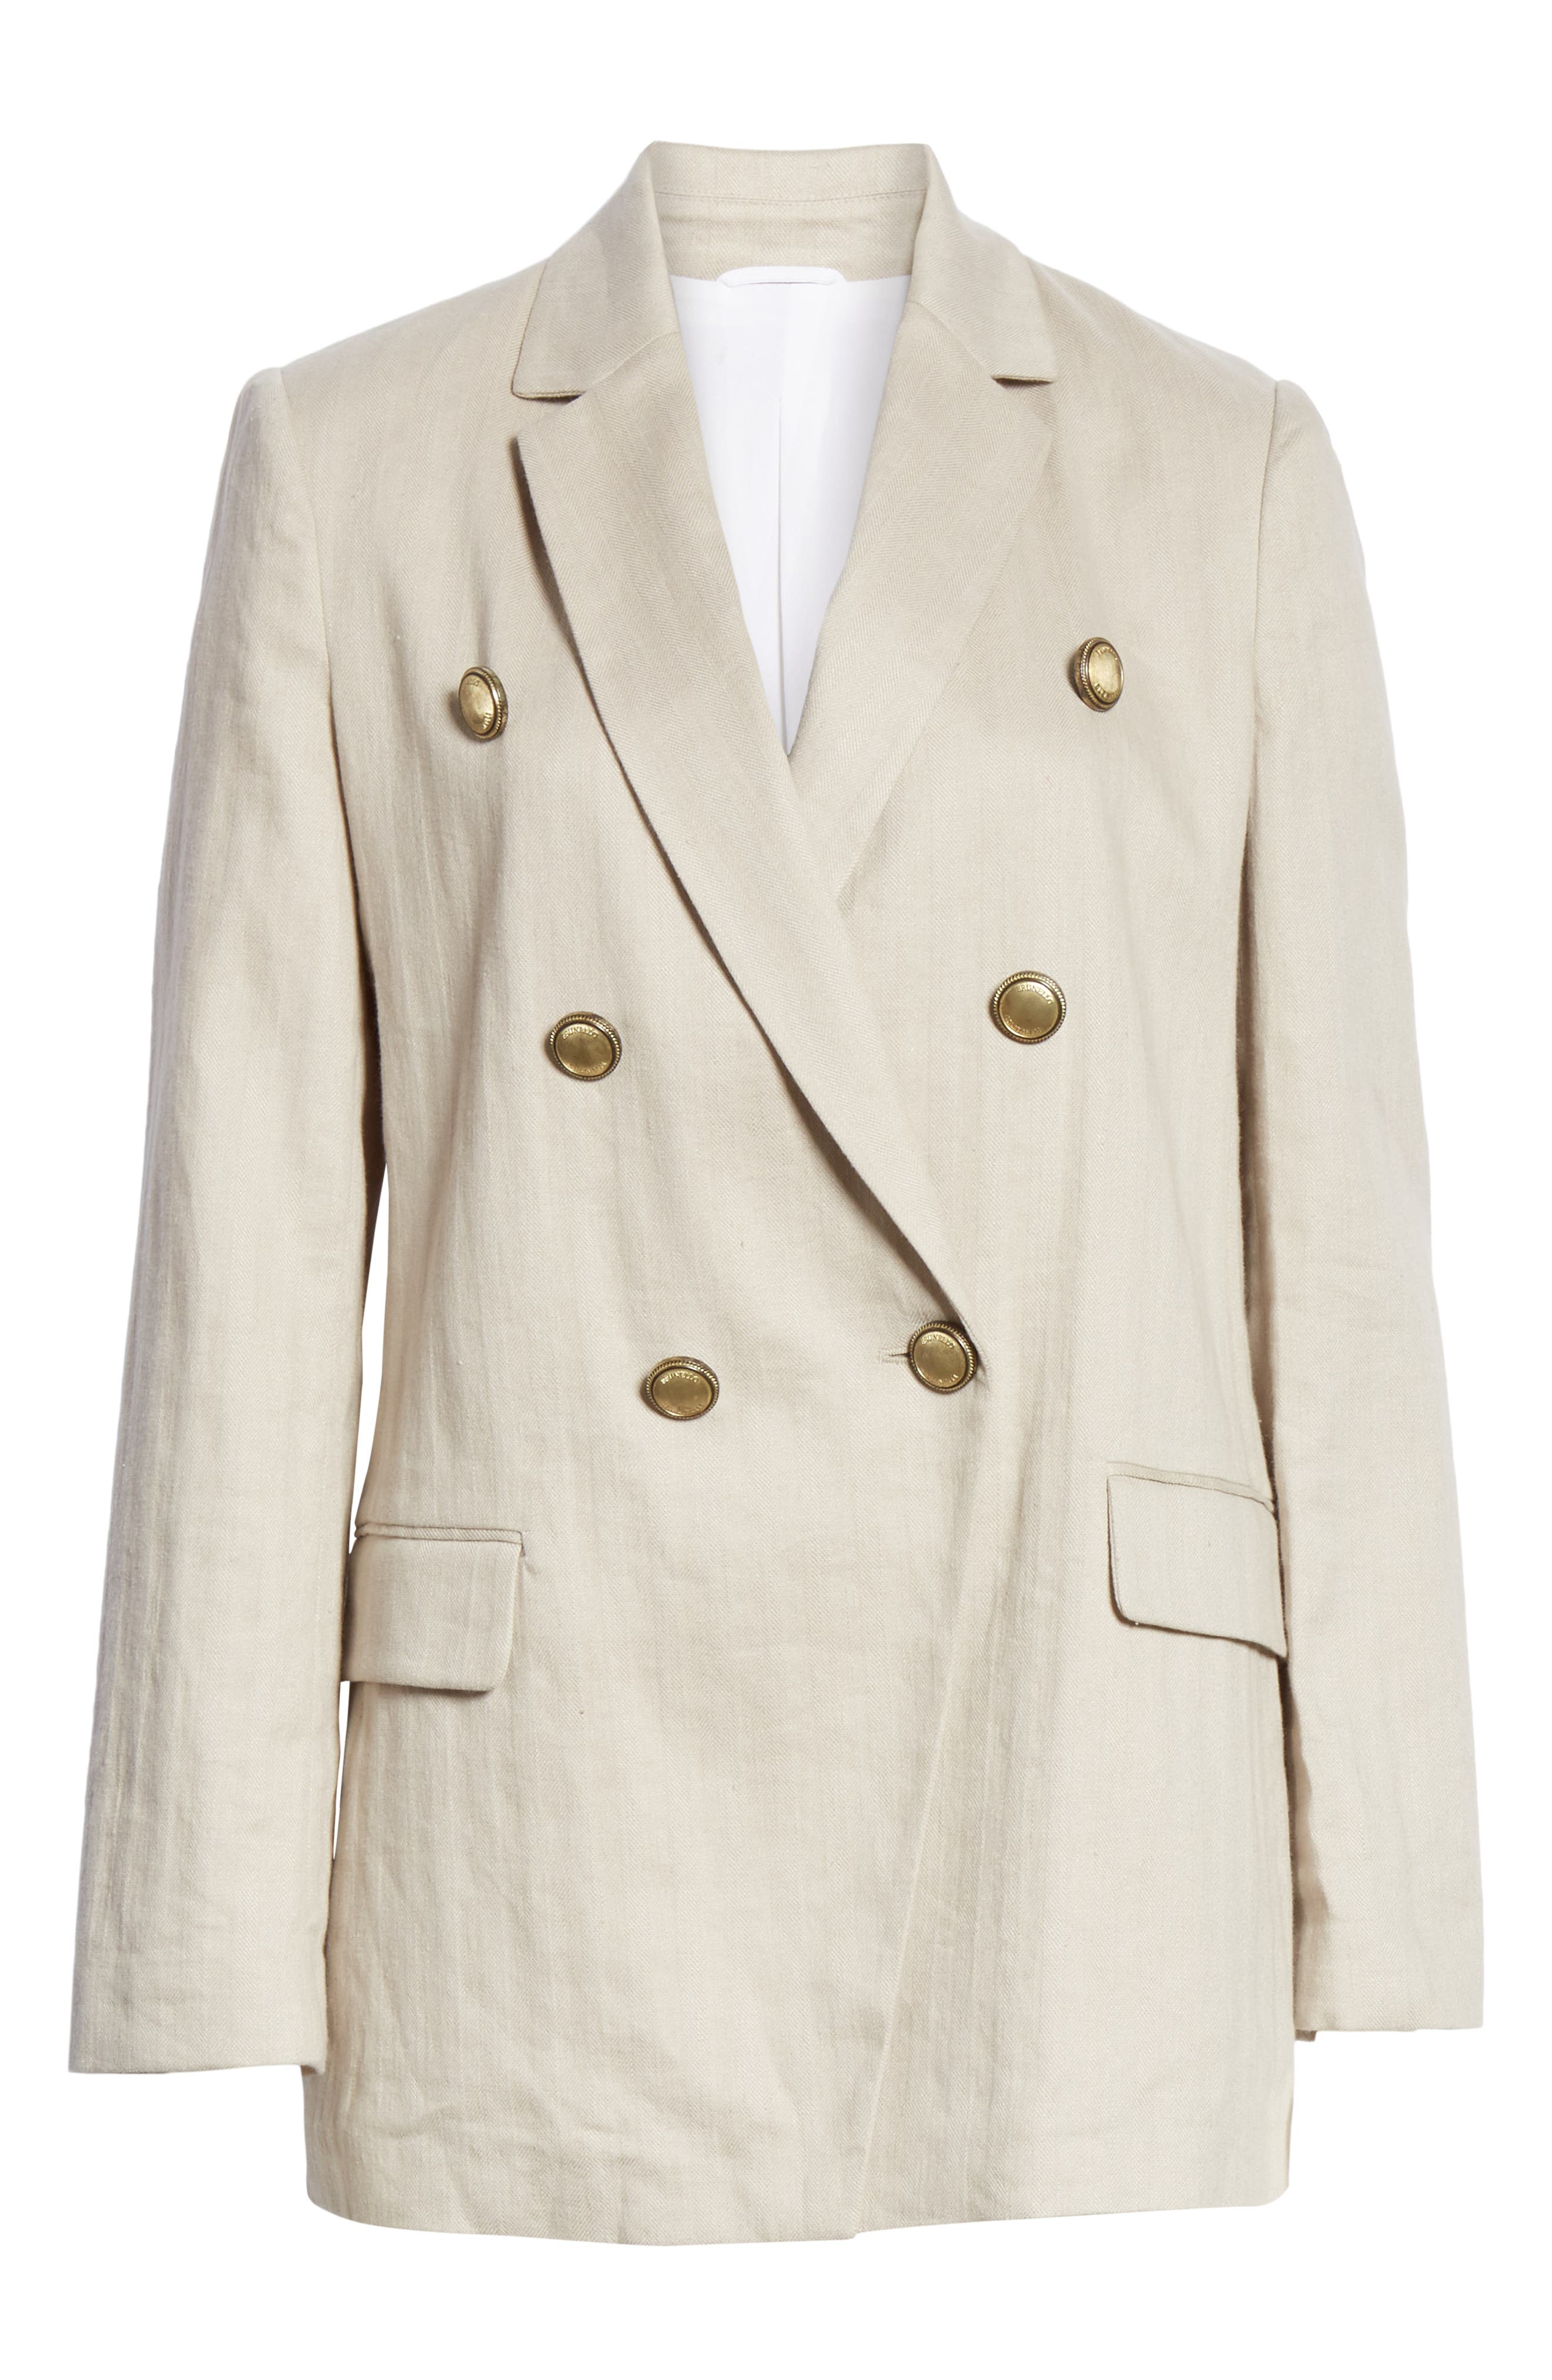 Chevron Weave Cotton & Linen Jacket,                             Alternate thumbnail 6, color,                             DESERT